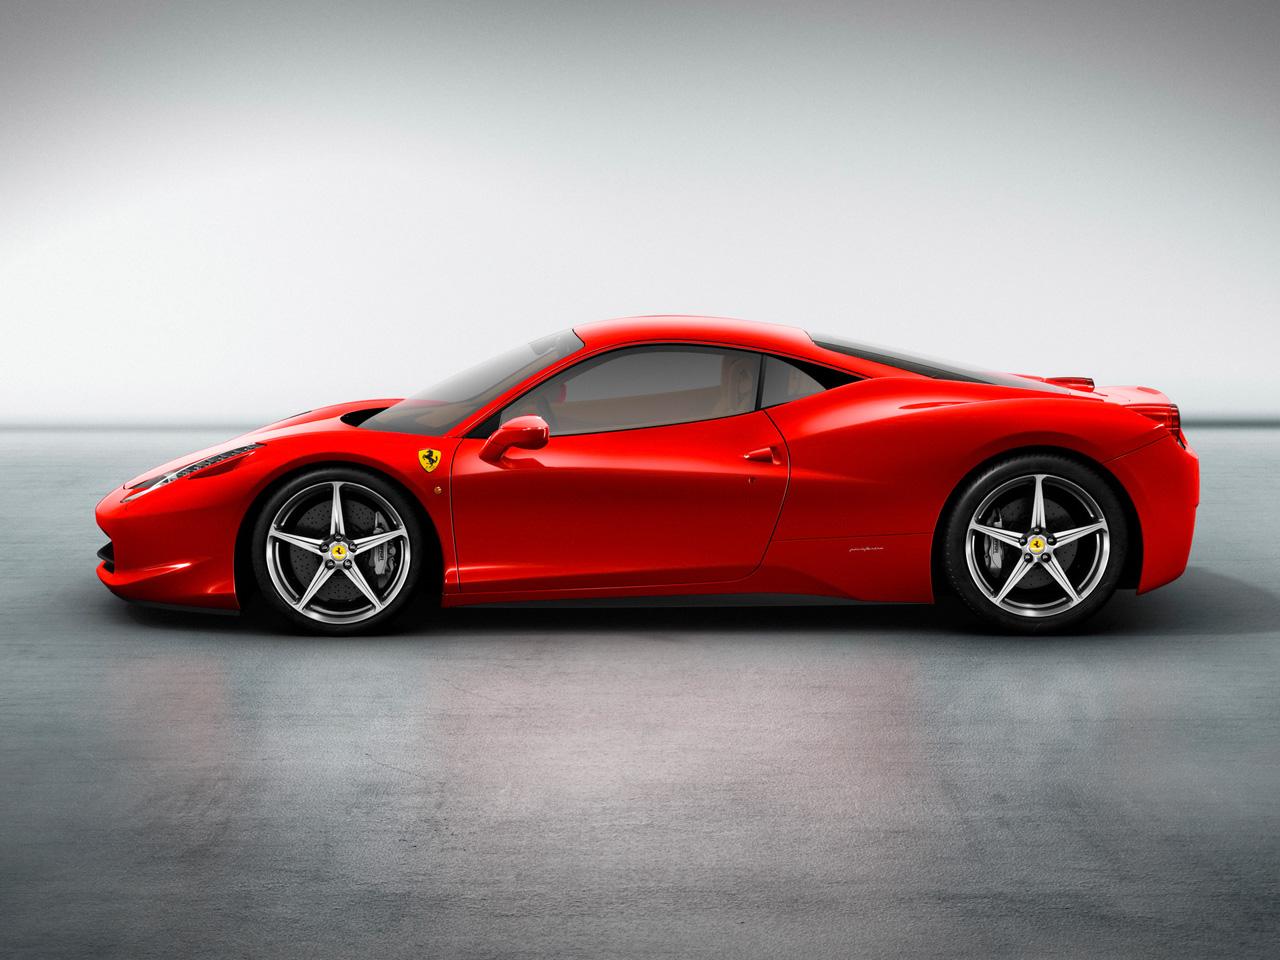 http://4.bp.blogspot.com/_XAfd_7tucsw/S9BNrVnk34I/AAAAAAAAELw/ozmGRikQqC0/s1600/2010+Ferrari+458+Italia+-+Side.jpg